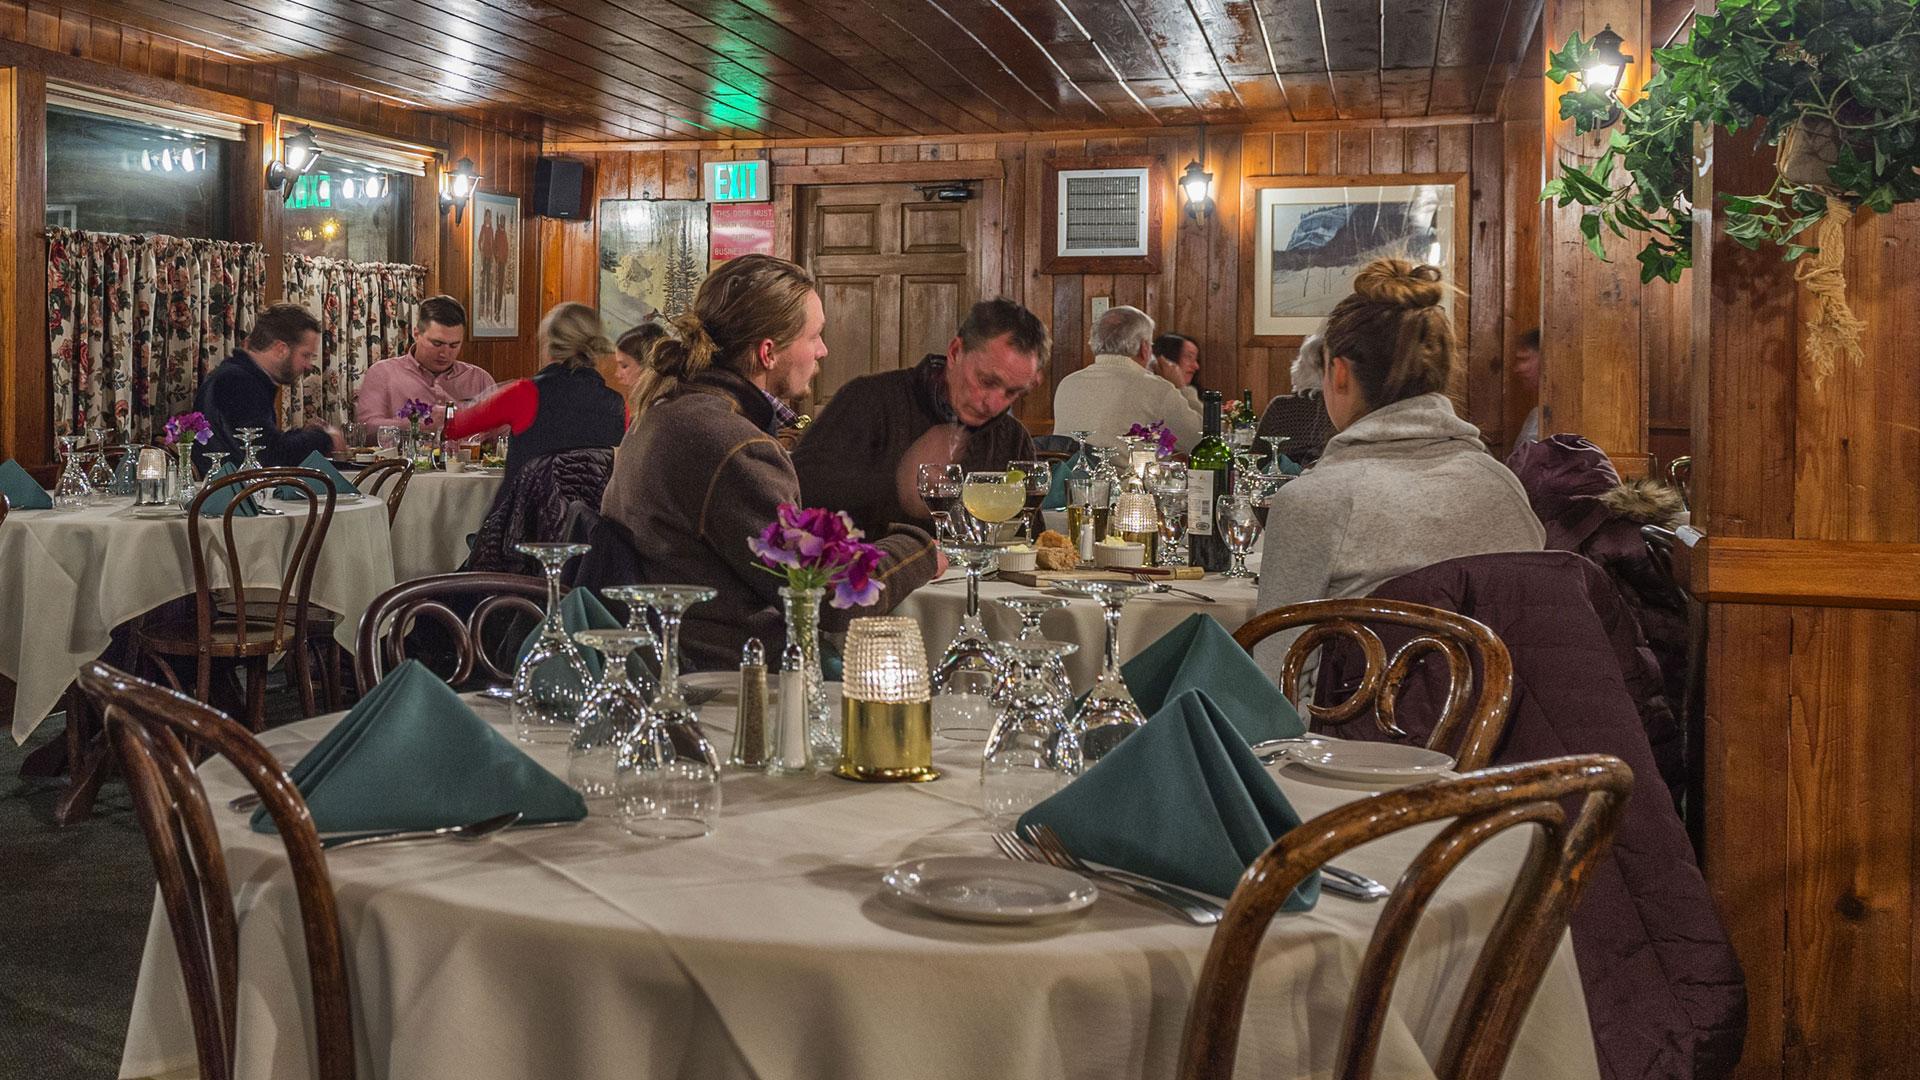 Snake River Saloon Steak House Steaks Seafood